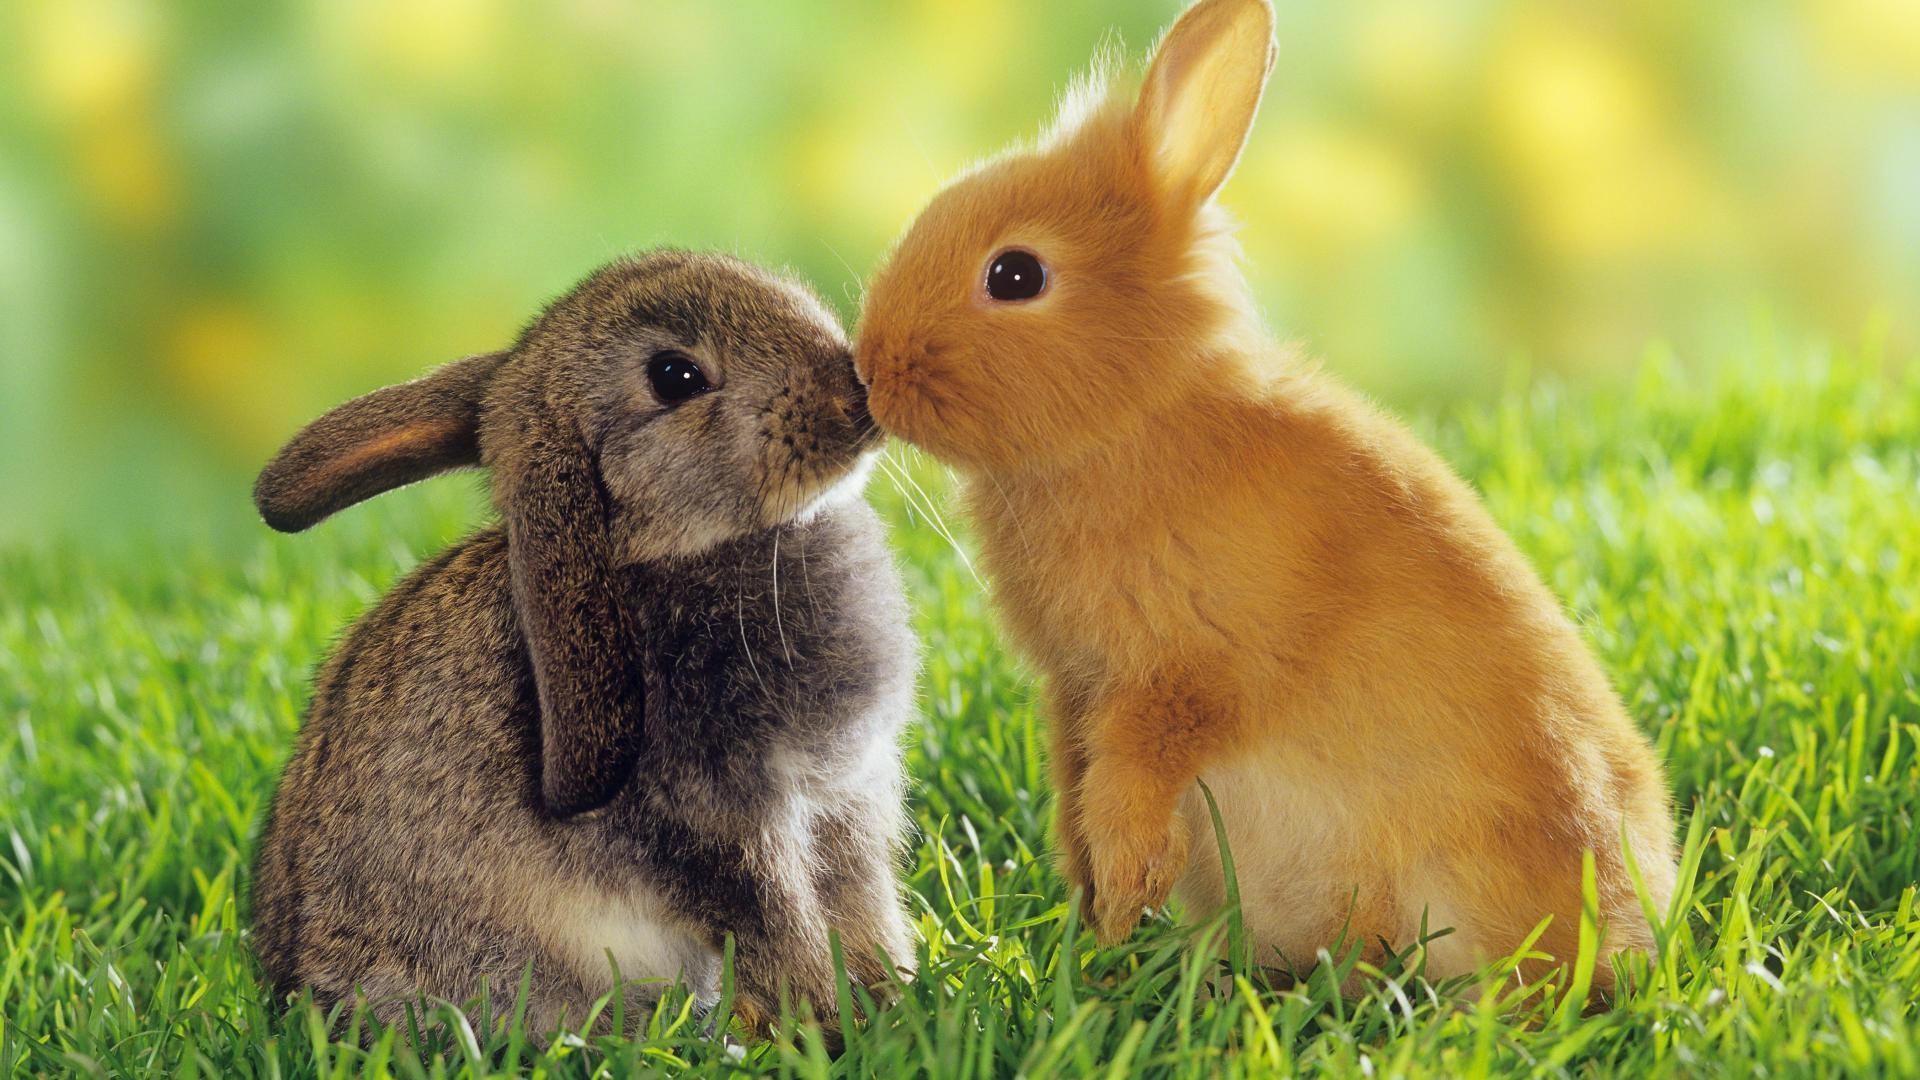 playboy-bunny-wallpaper-HD5-600×338